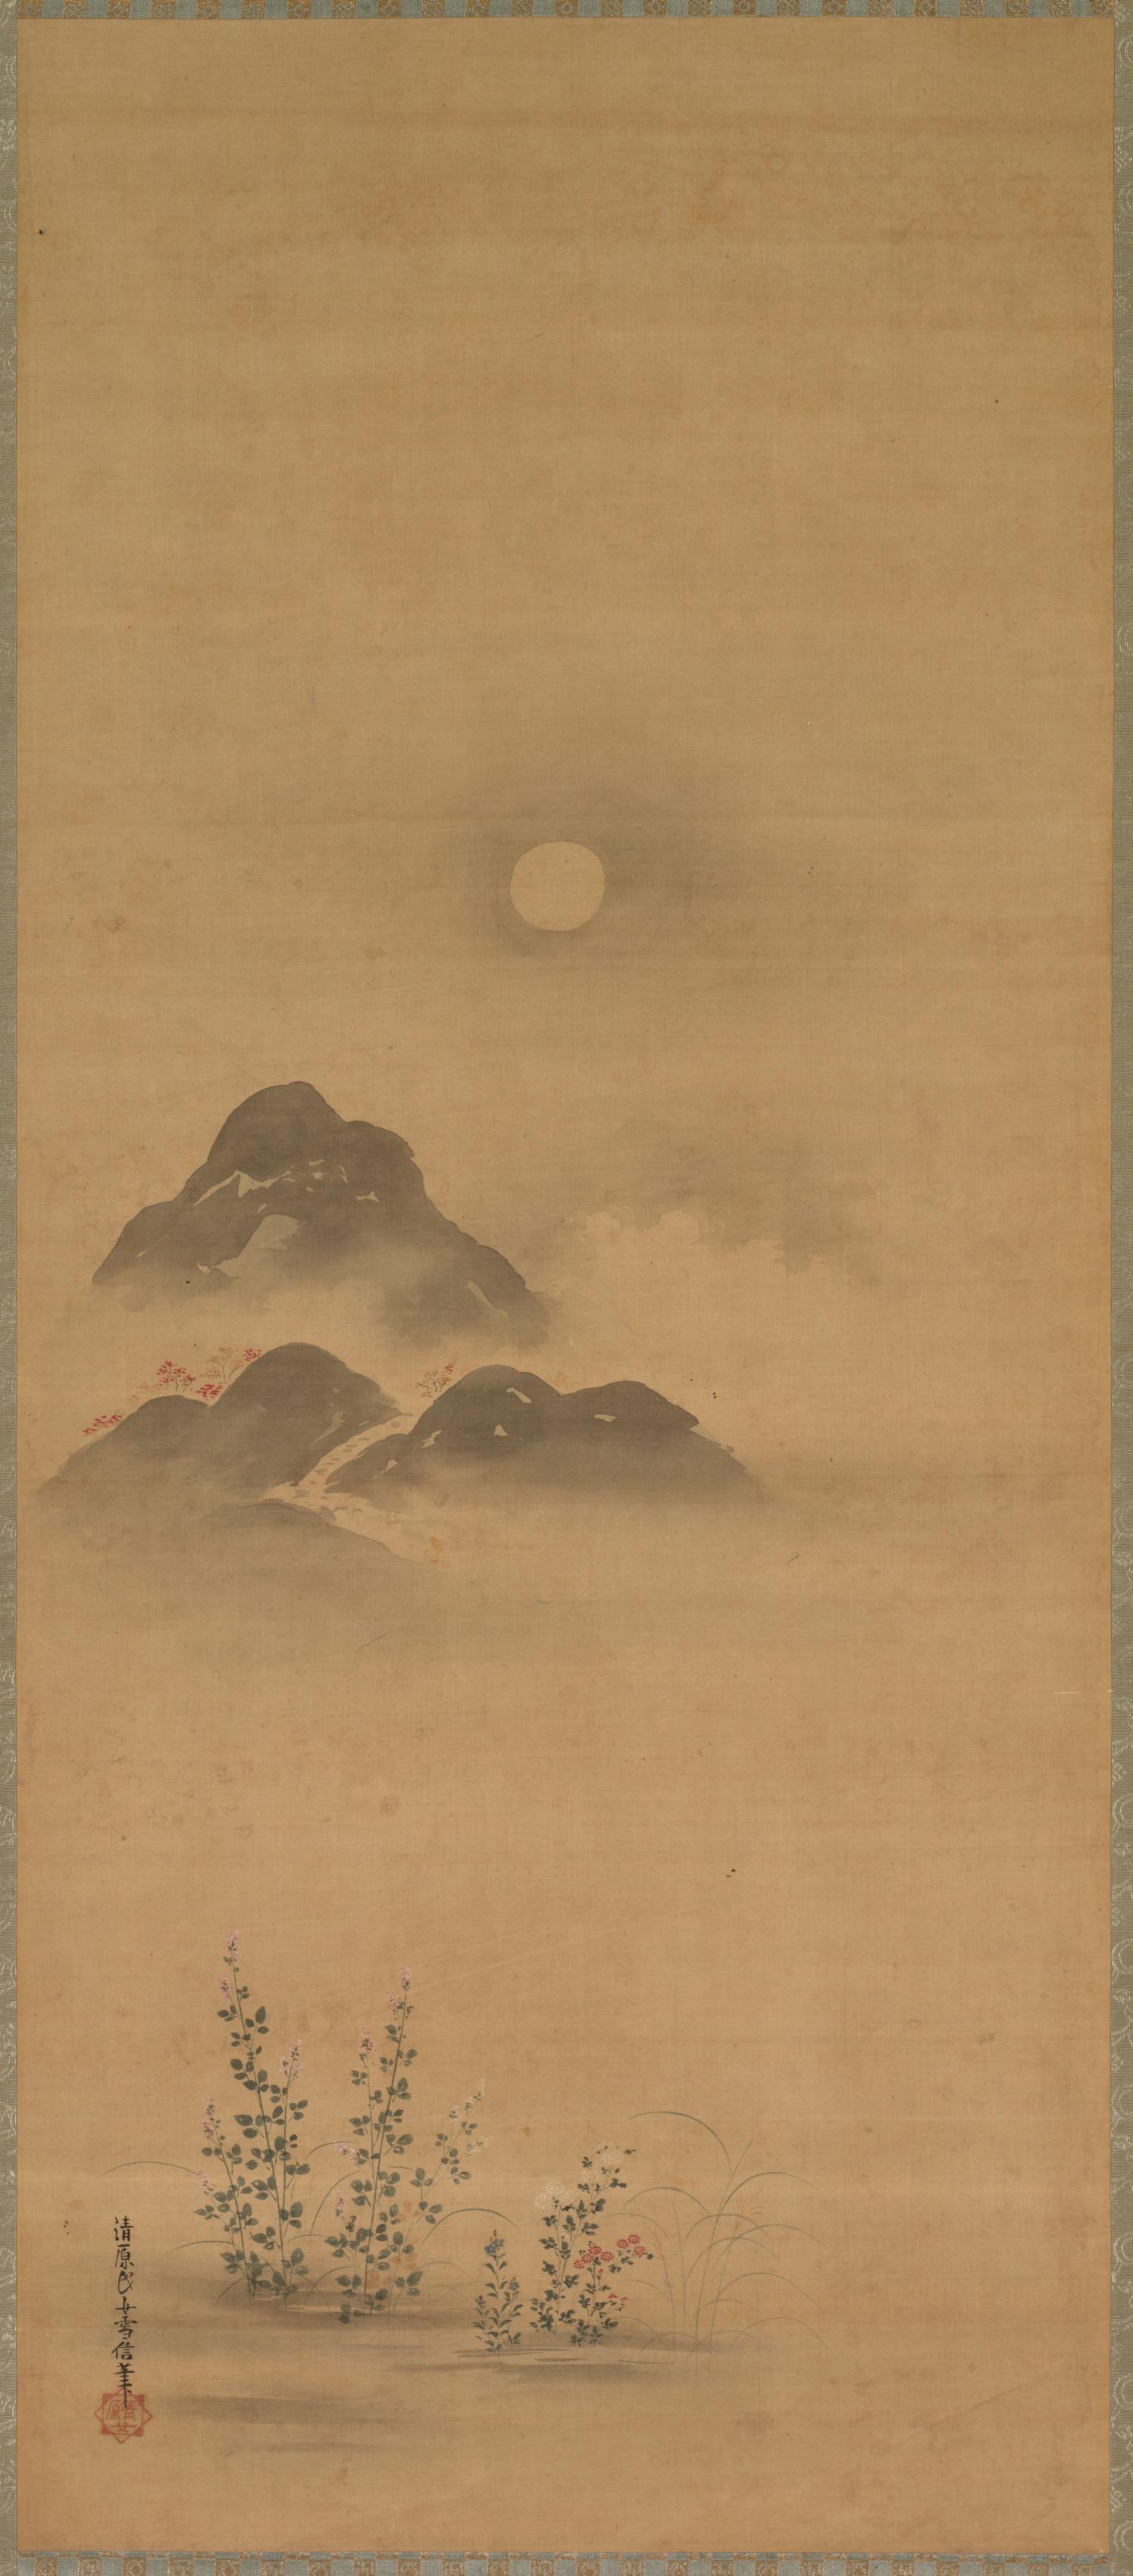 Yukinobu_Kiyohara_-_Autumn_Landscape_-_1